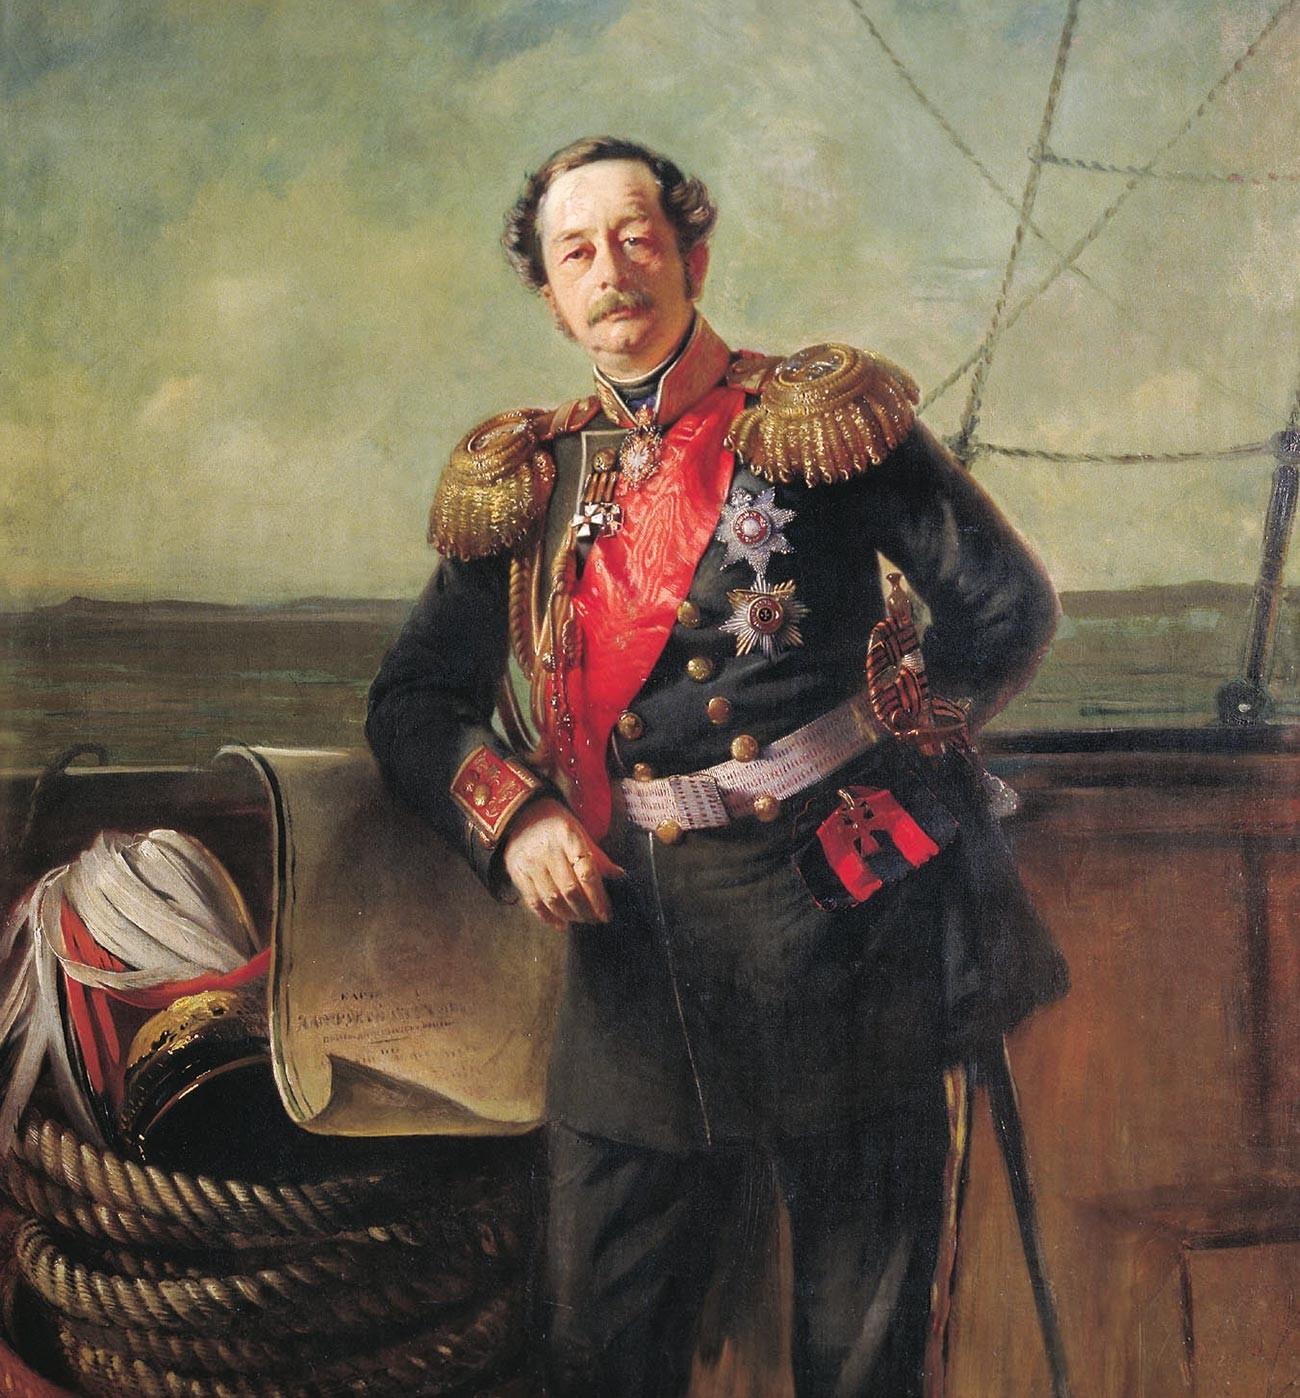 Potret Count Nikolay Muravyov-Amursky